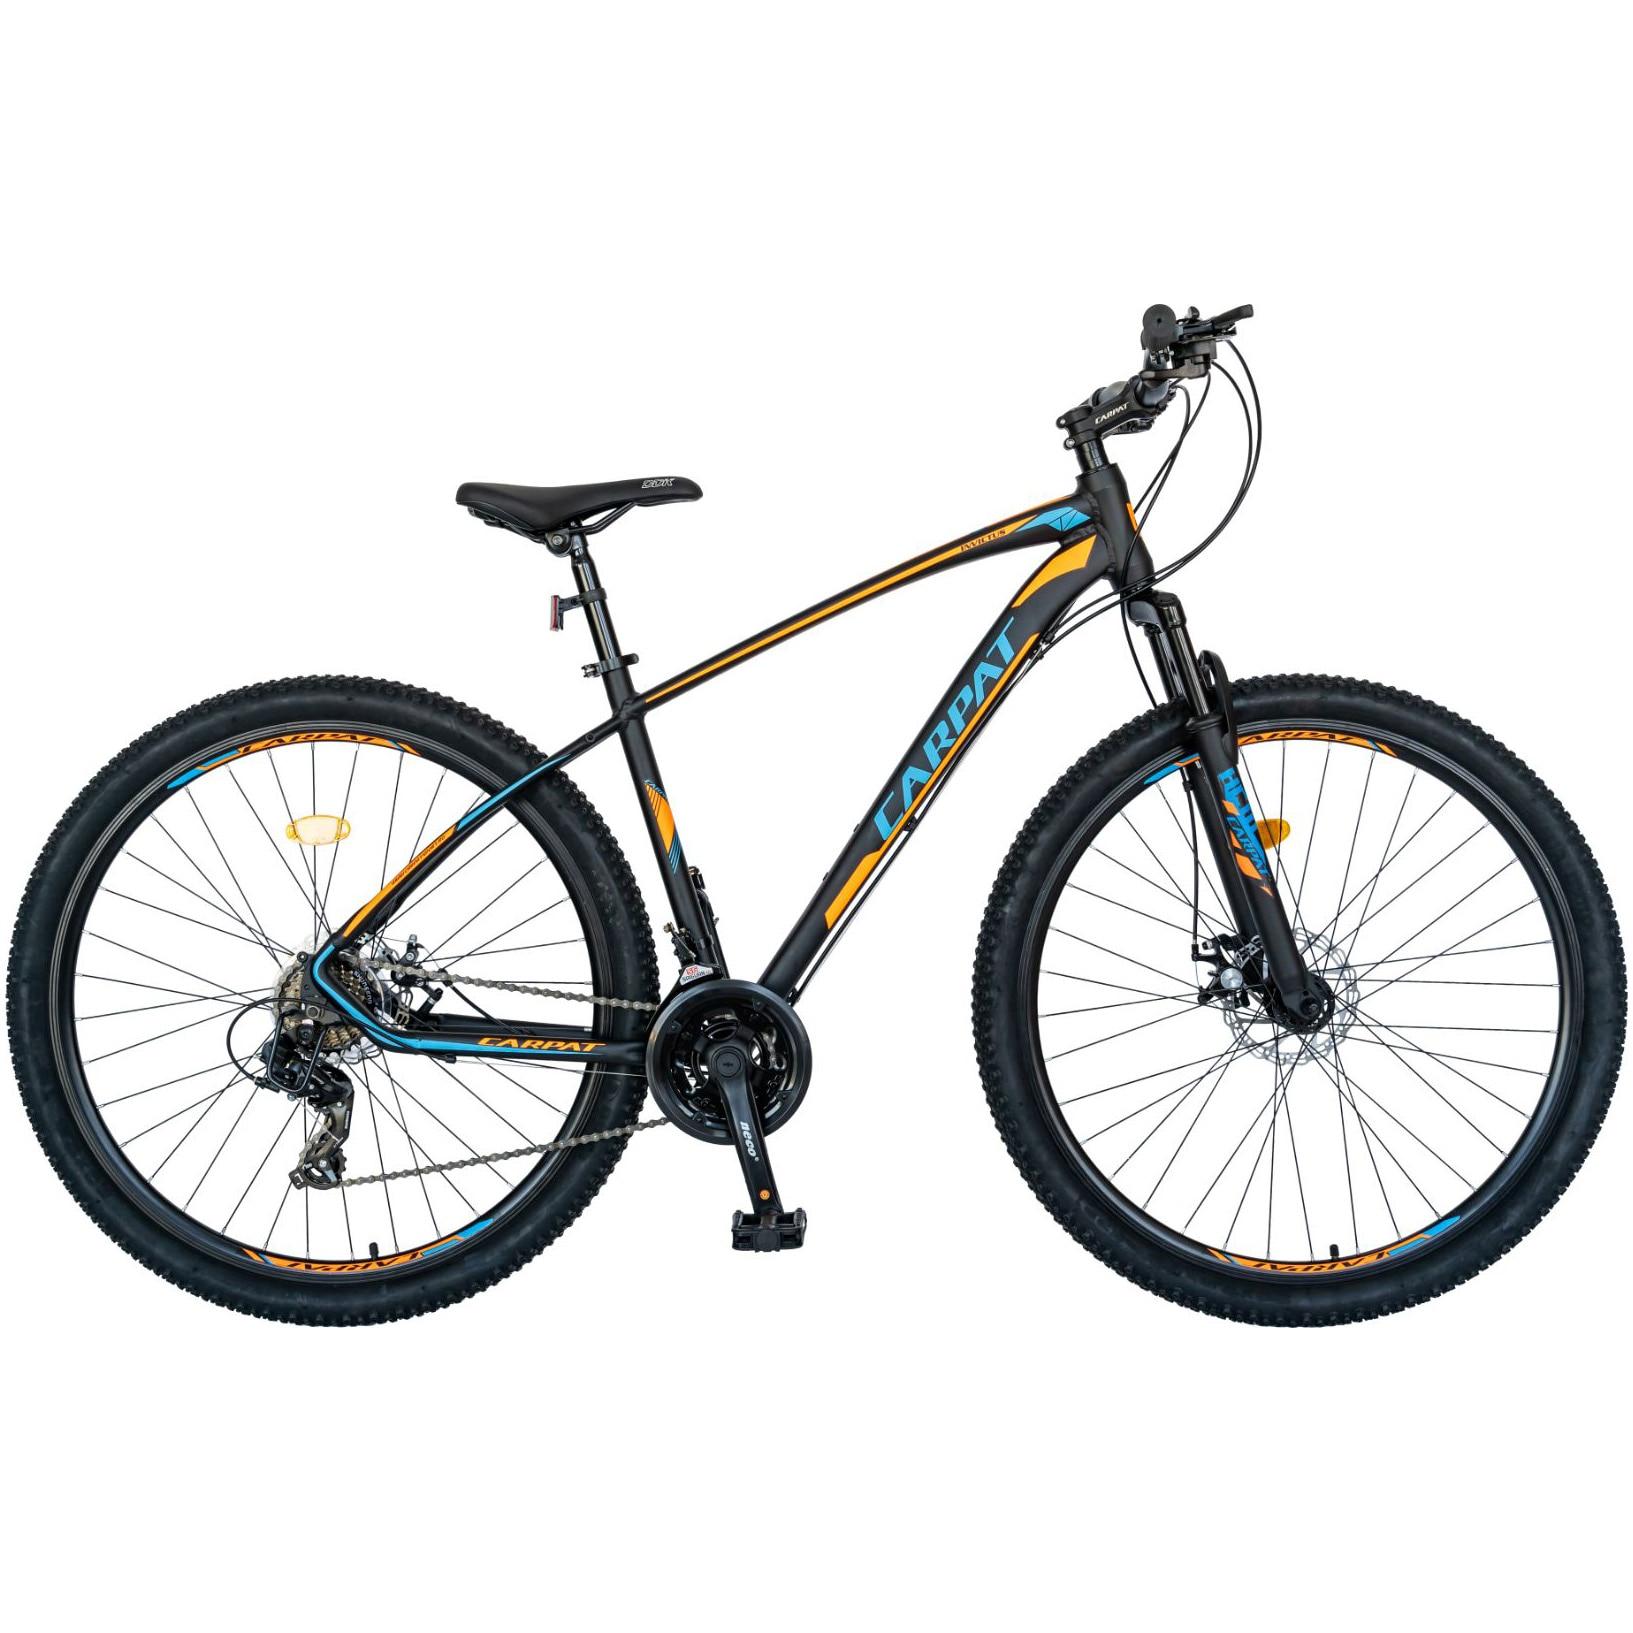 "Fotografie Bicicleta MTB 29"" Carpat C2957C, Negru/Portocaliu/Albastru"